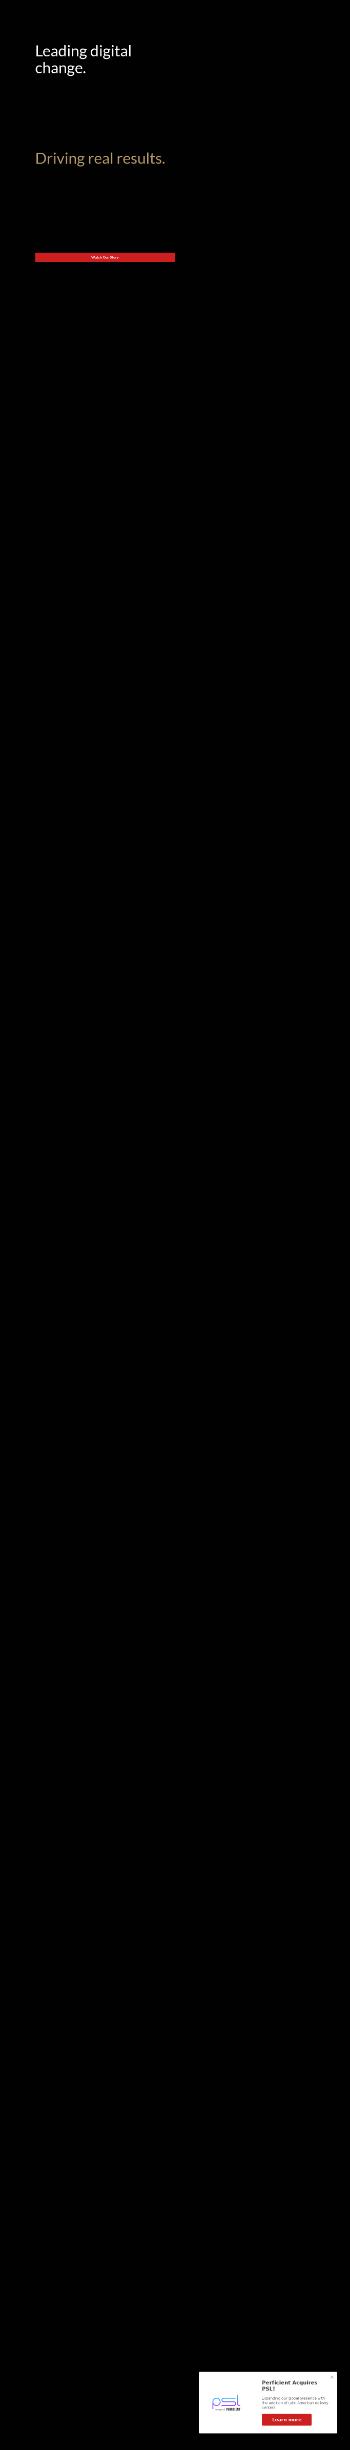 Perficient, Inc. Website Screenshot